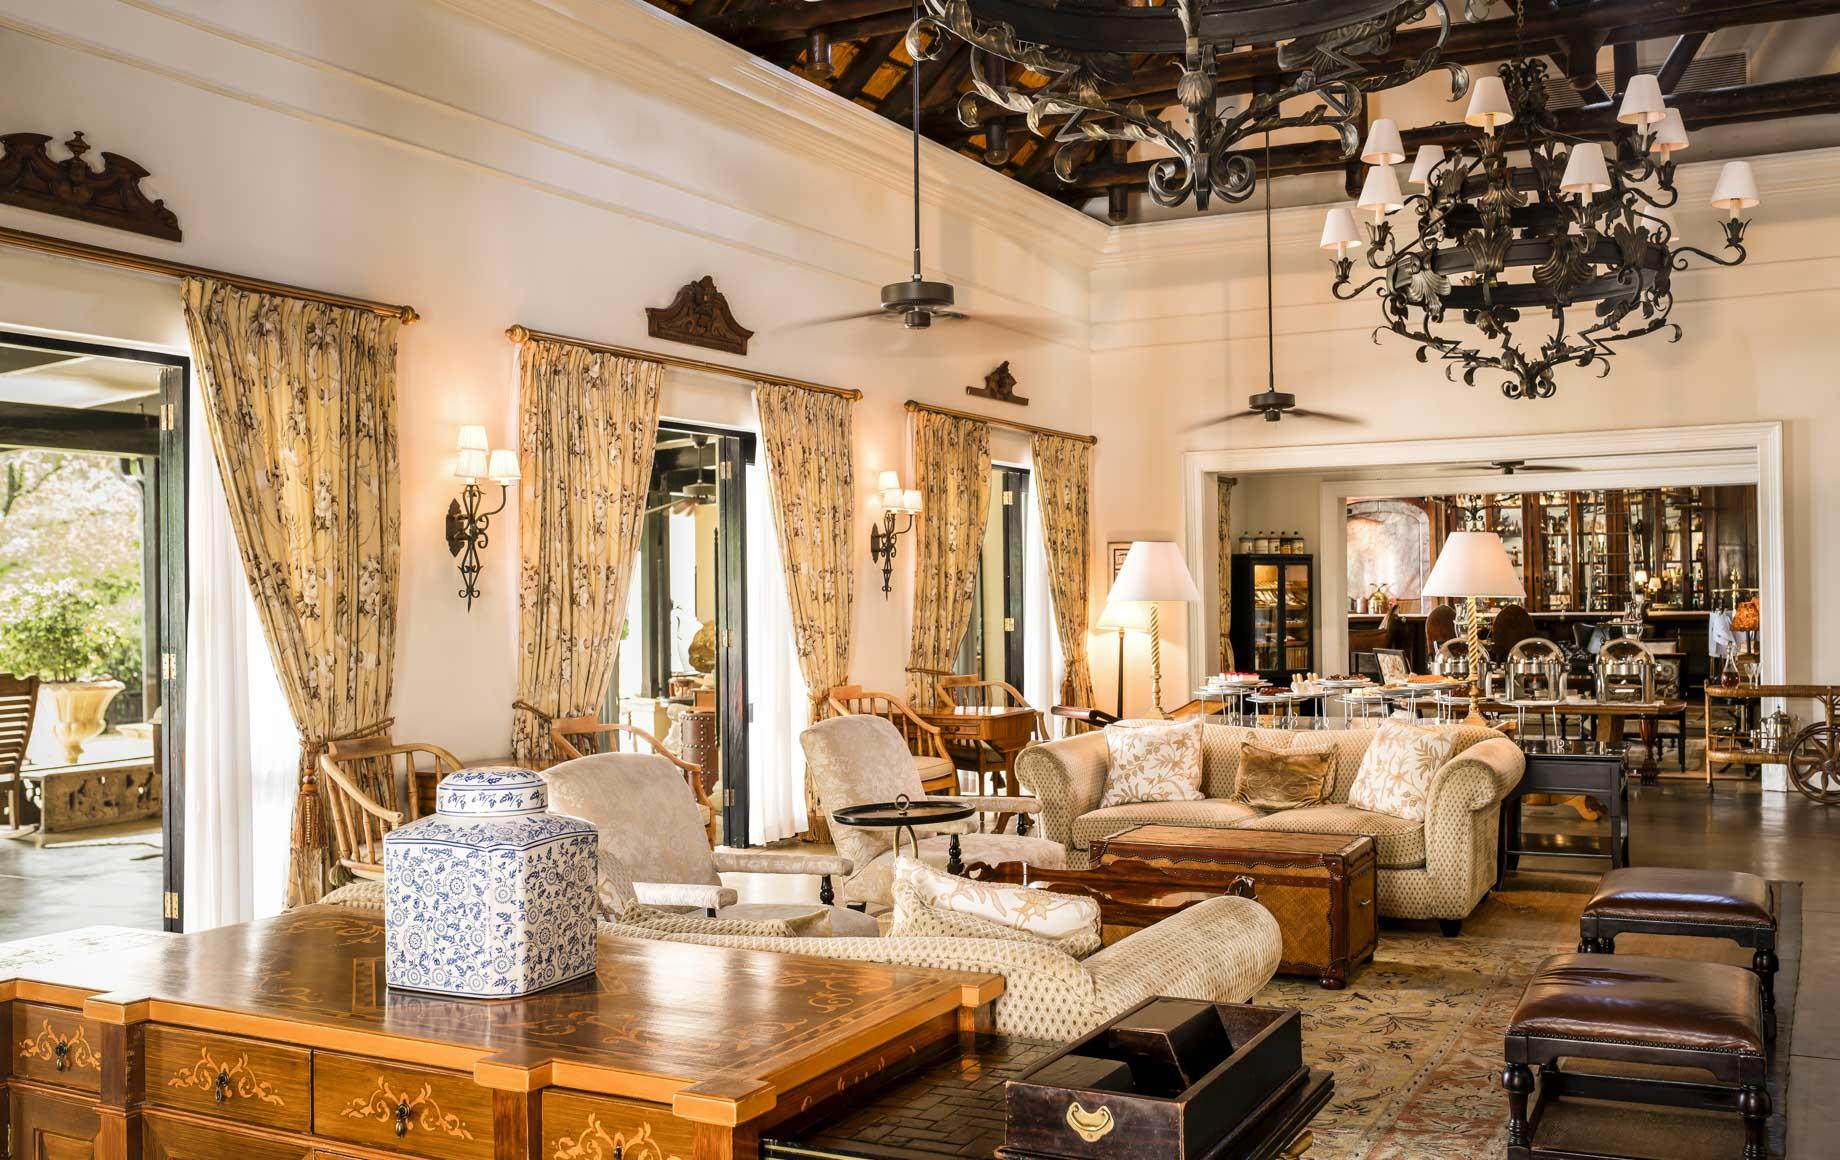 Royal Livingstone Hotel